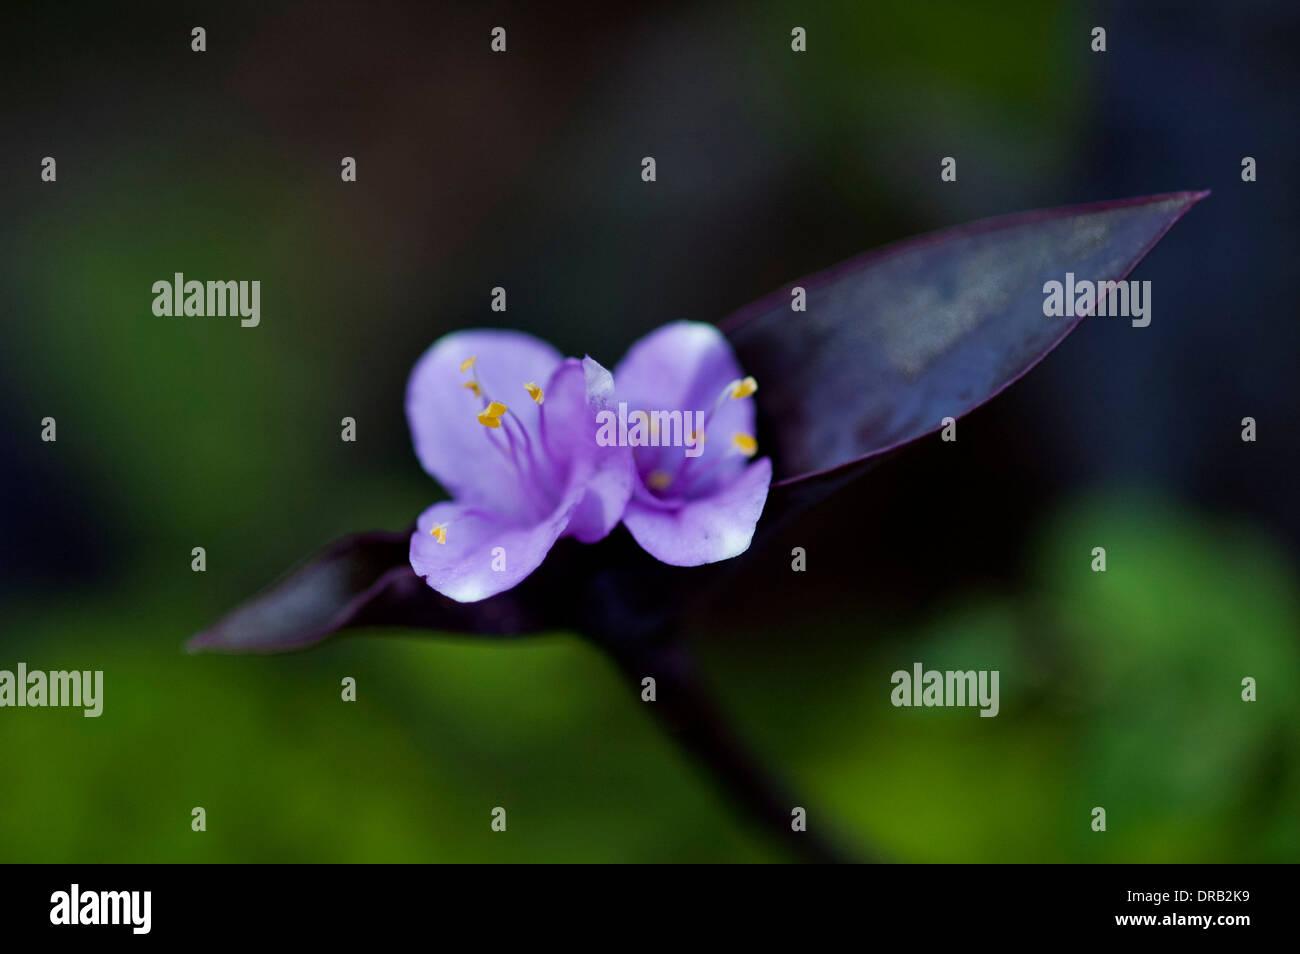 Wandering Jew in bloom - Stock Image